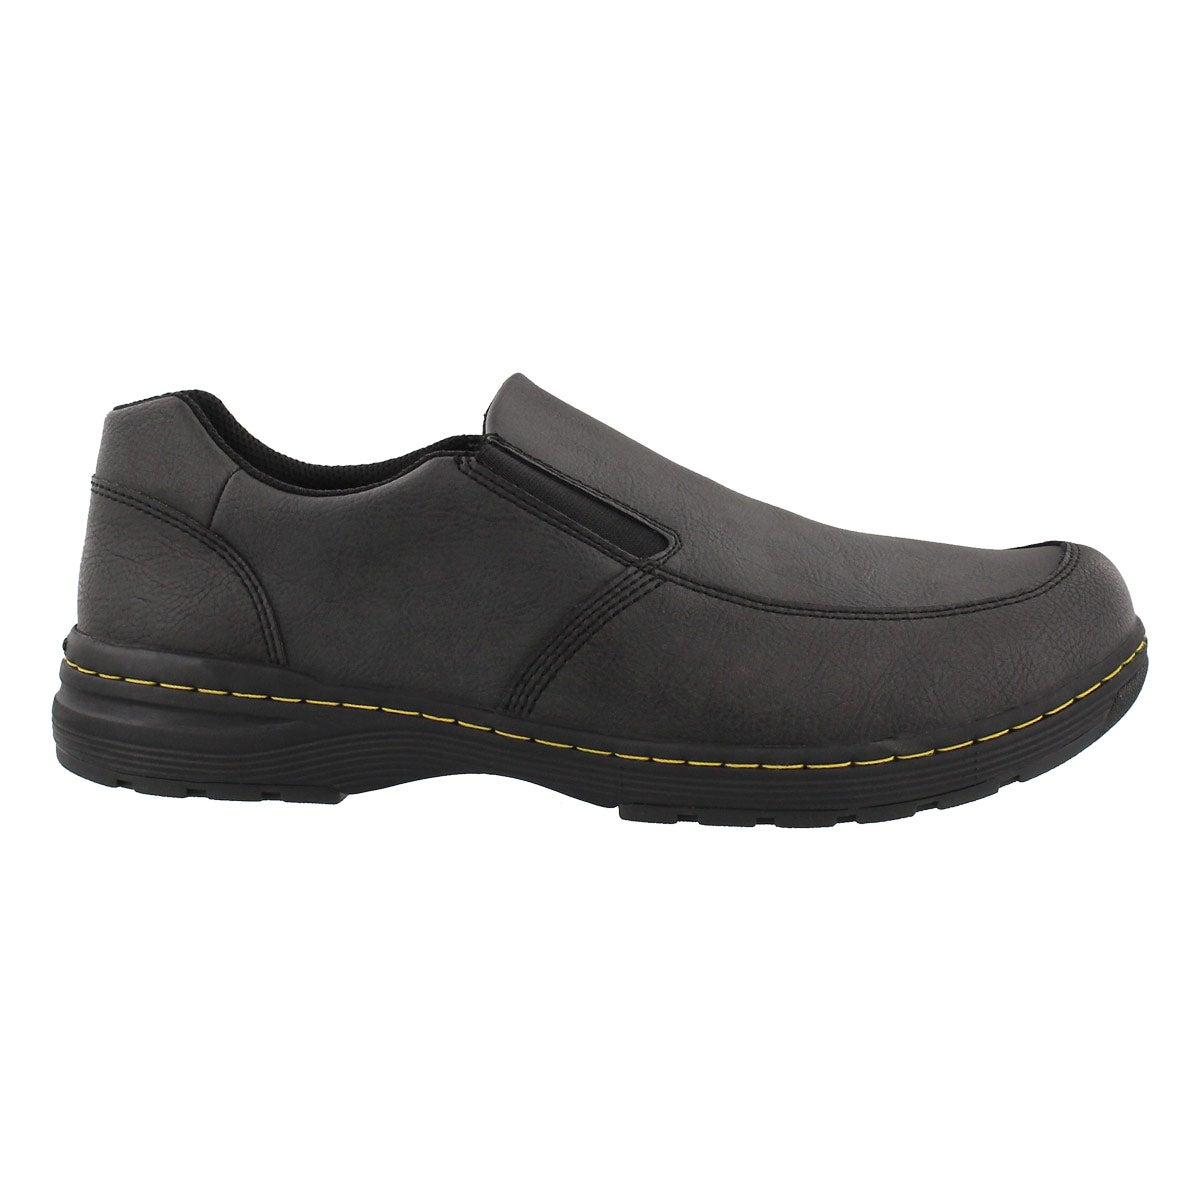 Mns Brennan black slip on casual shoe